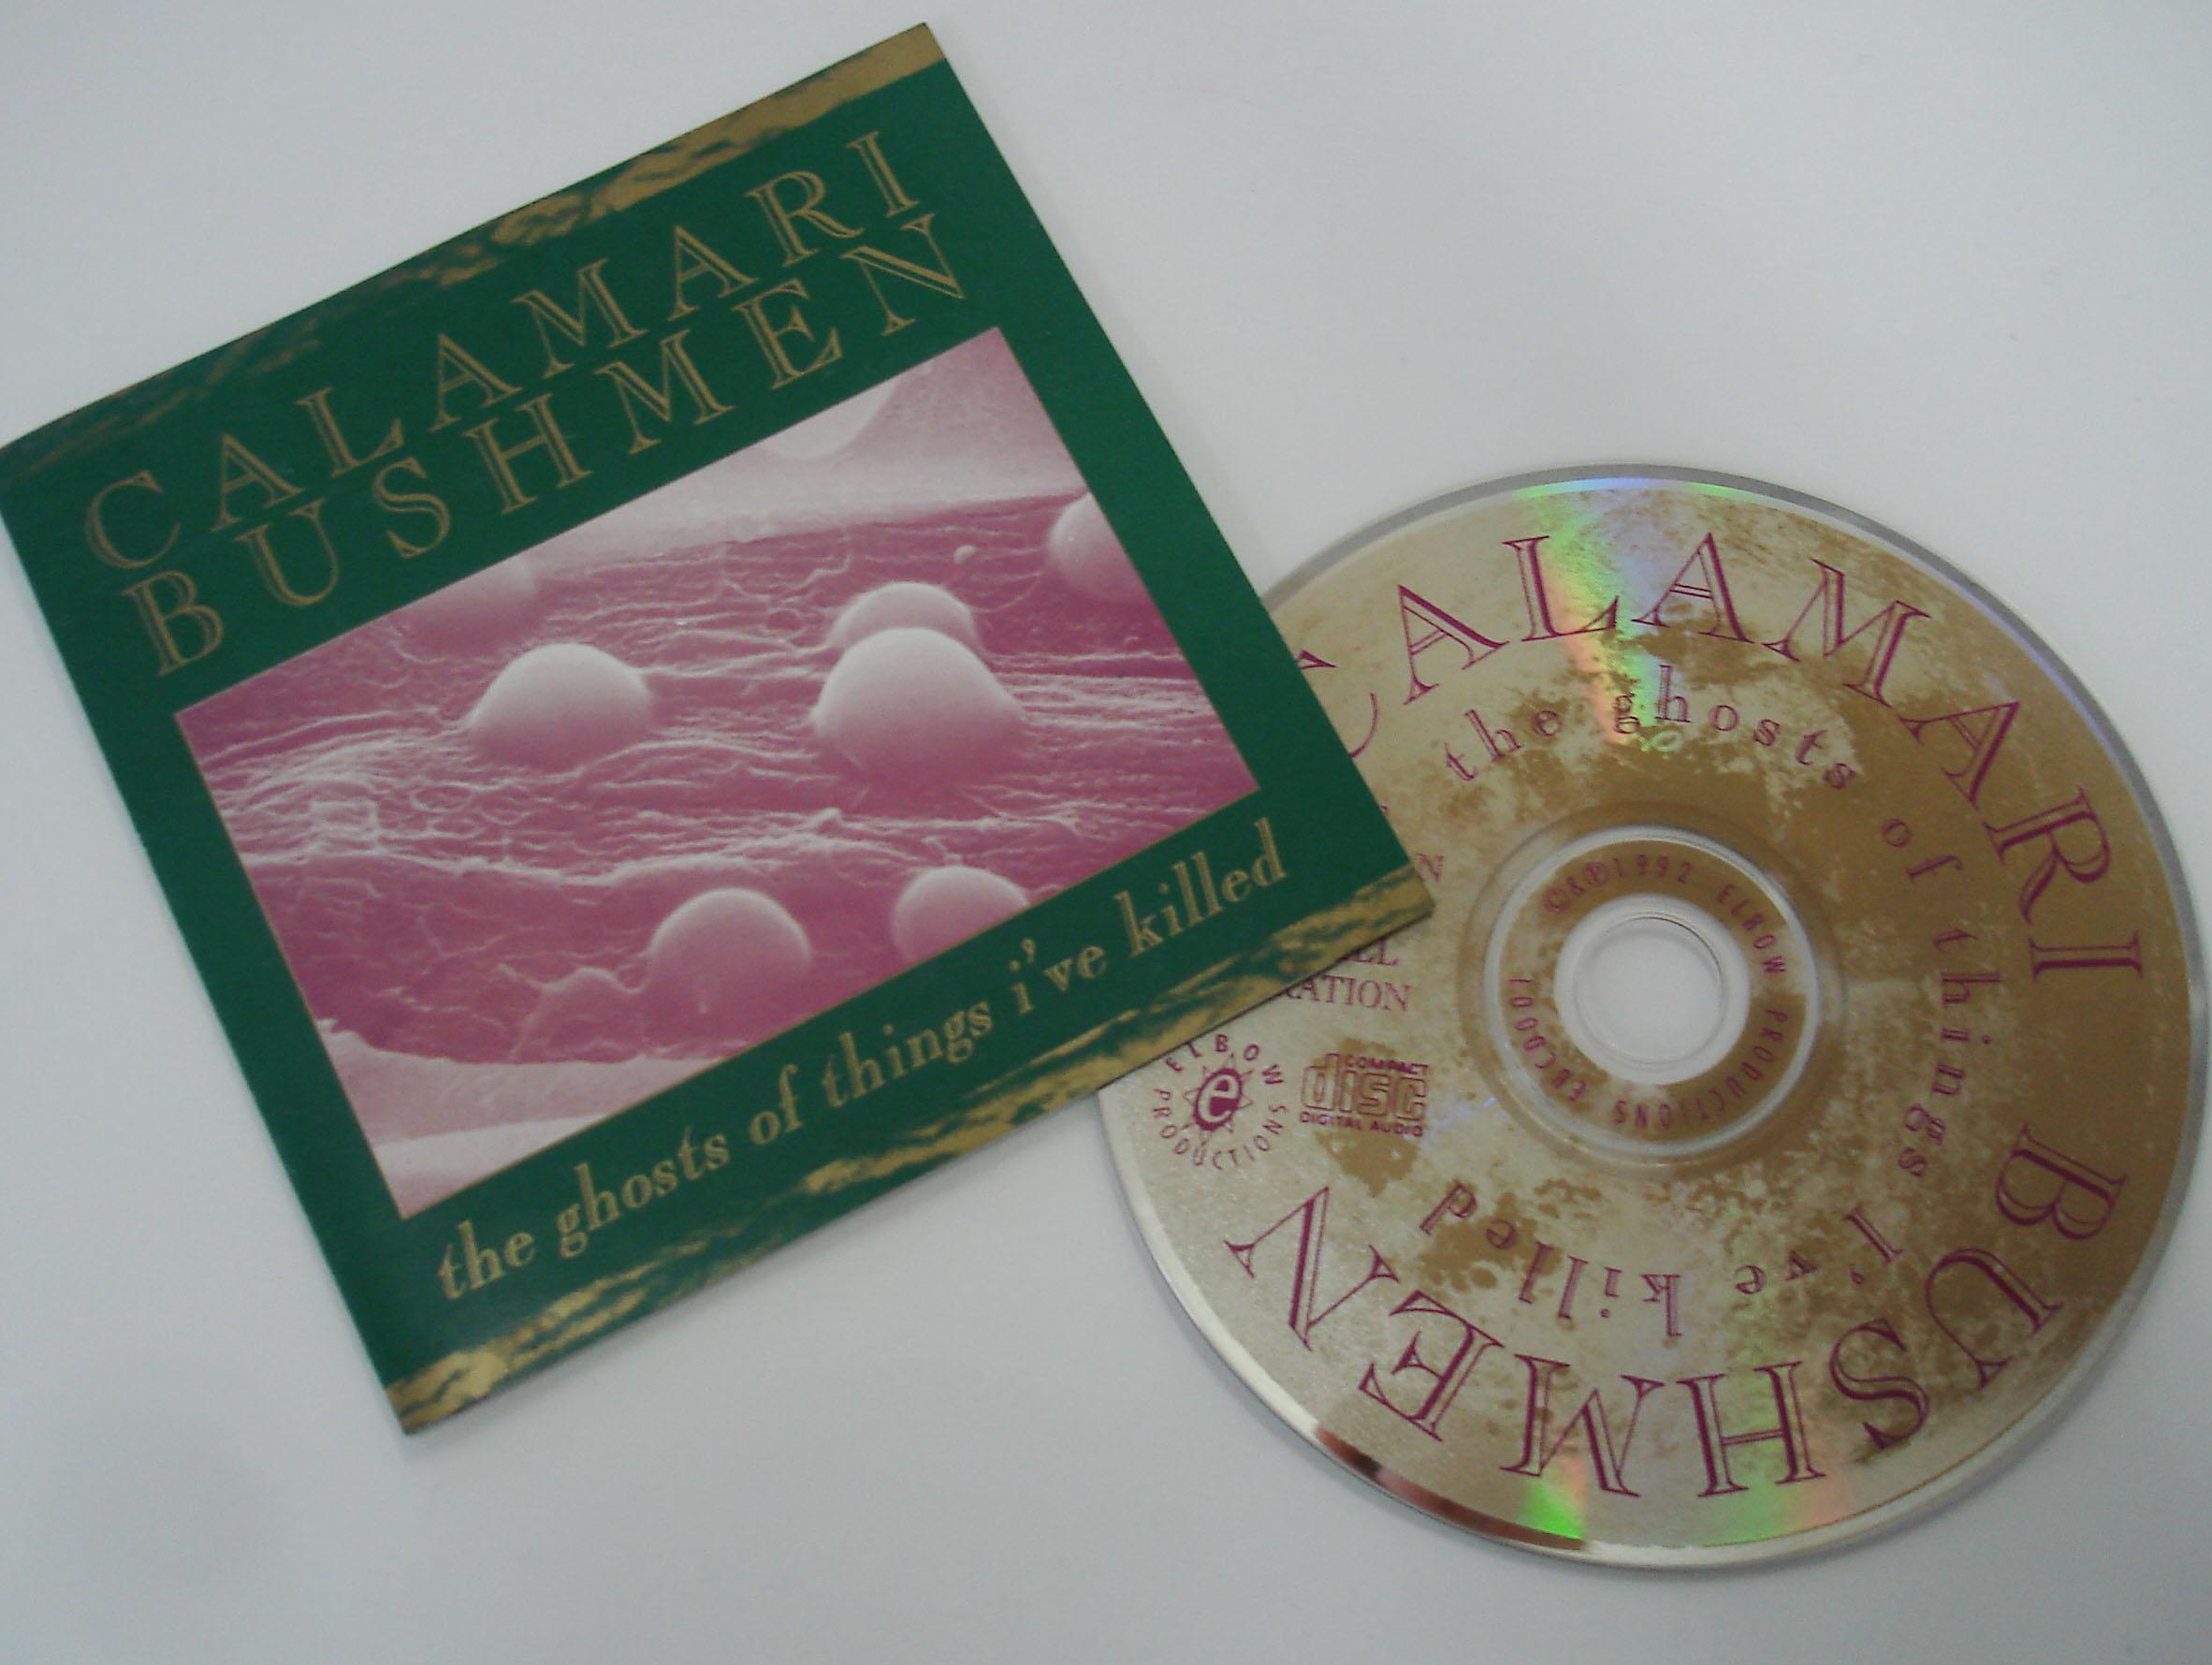 CALAMARI BUSHMEN - THE GHOSTS OF THINGS I'VE KILLED - MINI ALBUM